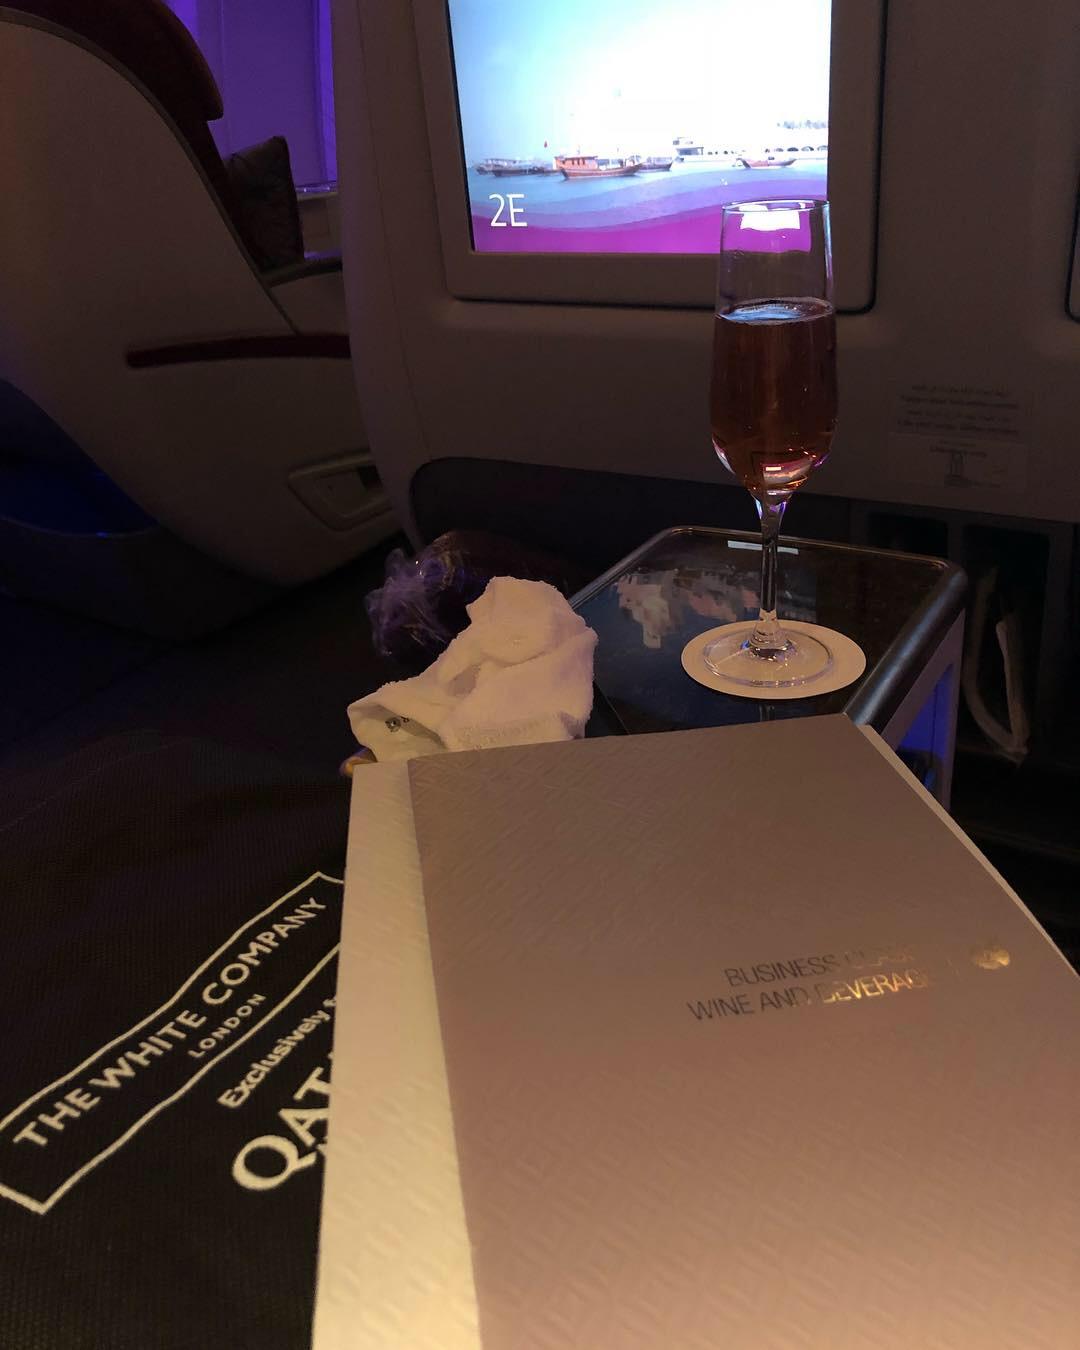 Qatar Airways Boeimg 777-300ER Business Class Product